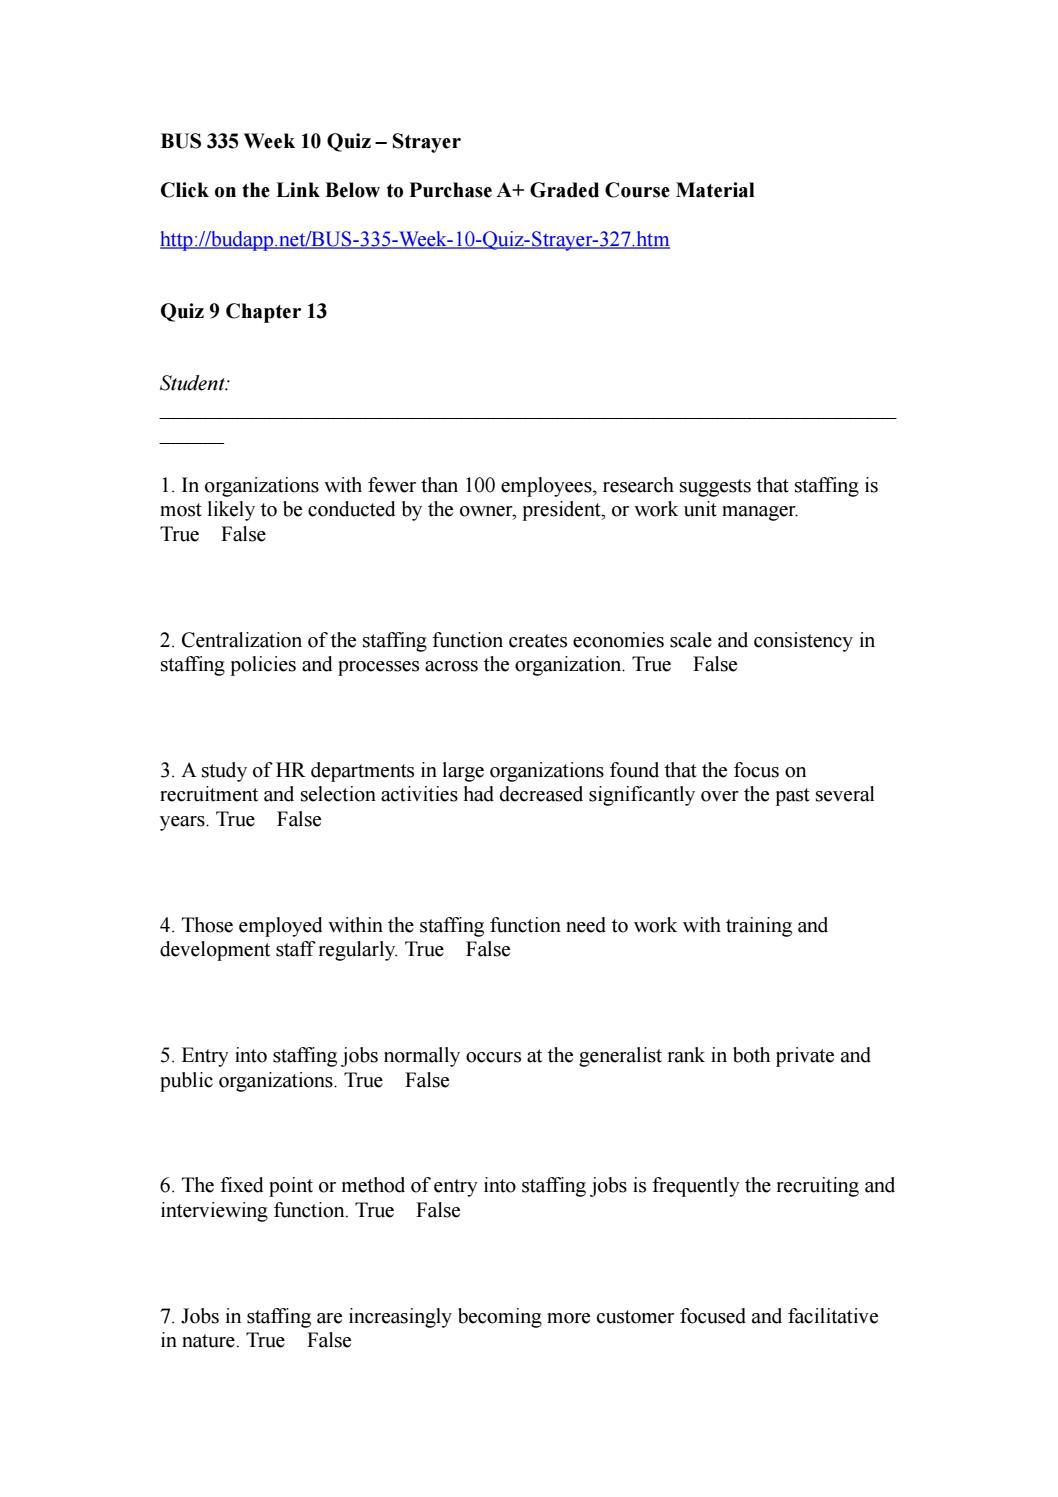 Bus 335 staffing organizations week 10 quiz by